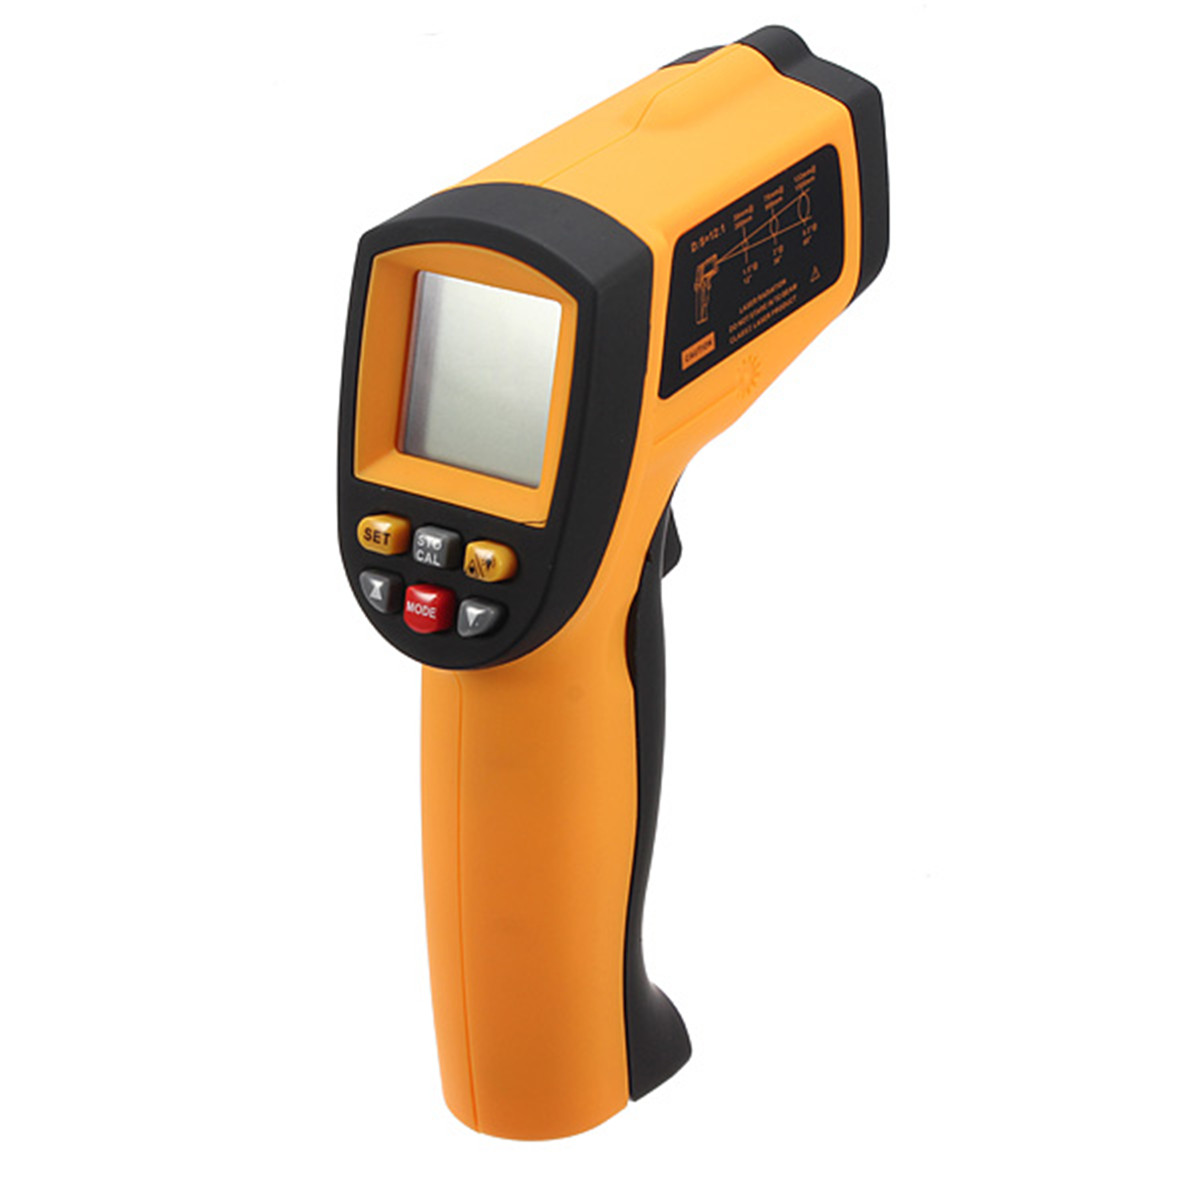 GM900 Digital LCD Infrared Thermometer Gun IR Laster Temperature Meter Non contact Handheld 50~900 Degree Centigrade Pyrometer